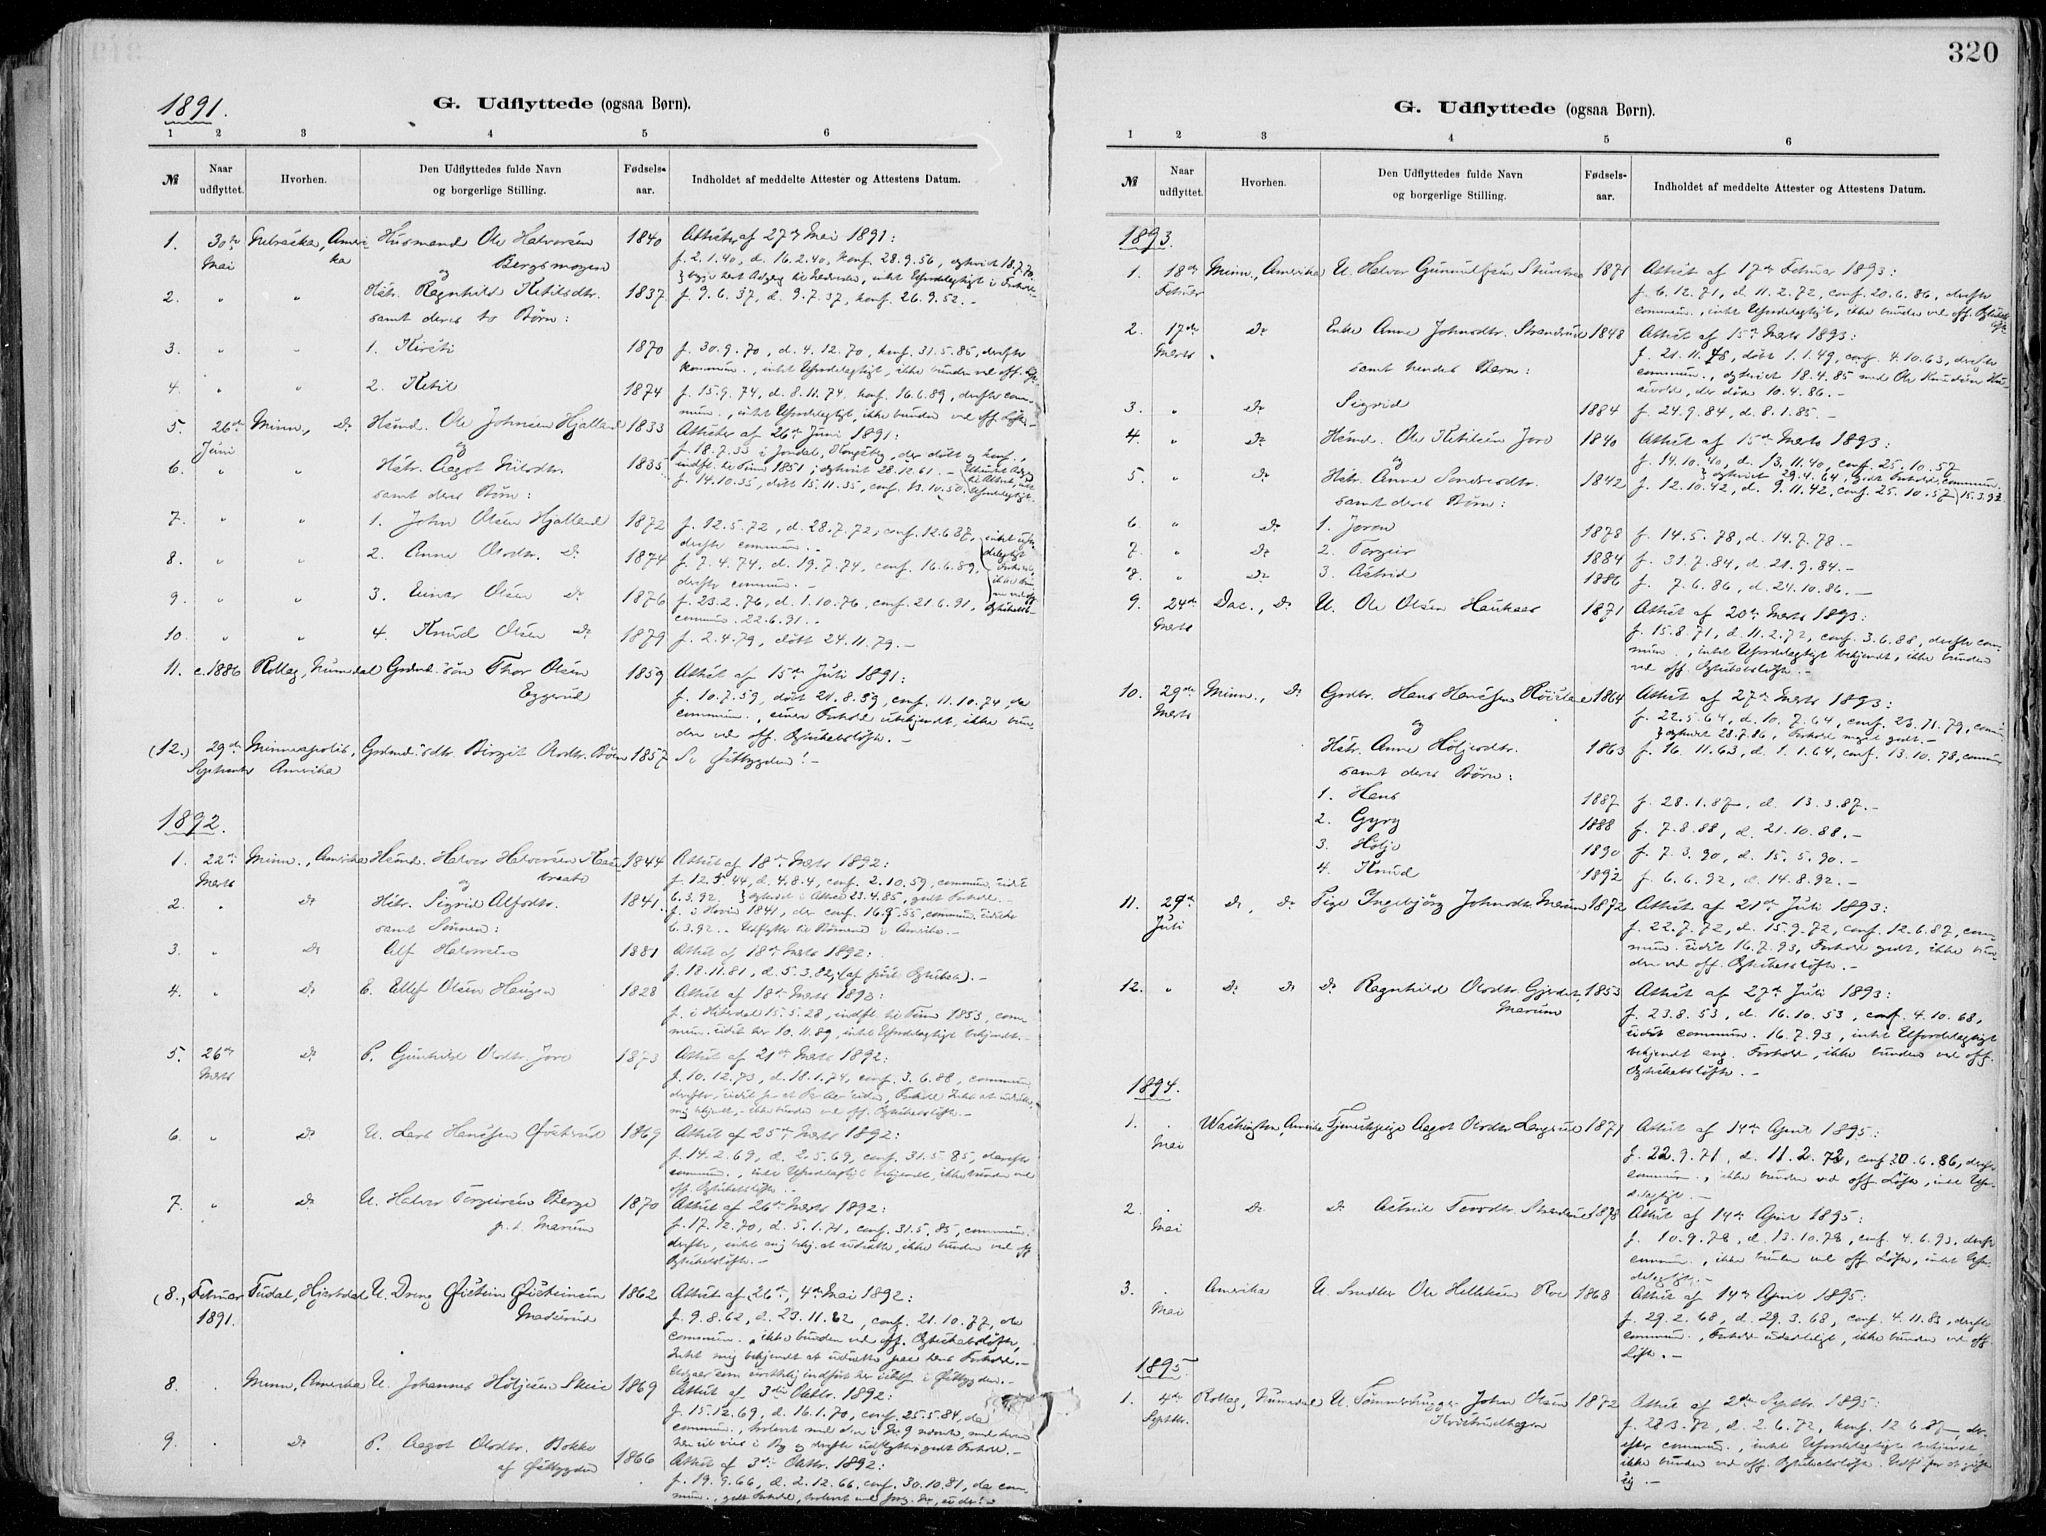 SAKO, Tinn kirkebøker, F/Fa/L0007: Ministerialbok nr. I 7, 1878-1922, s. 320